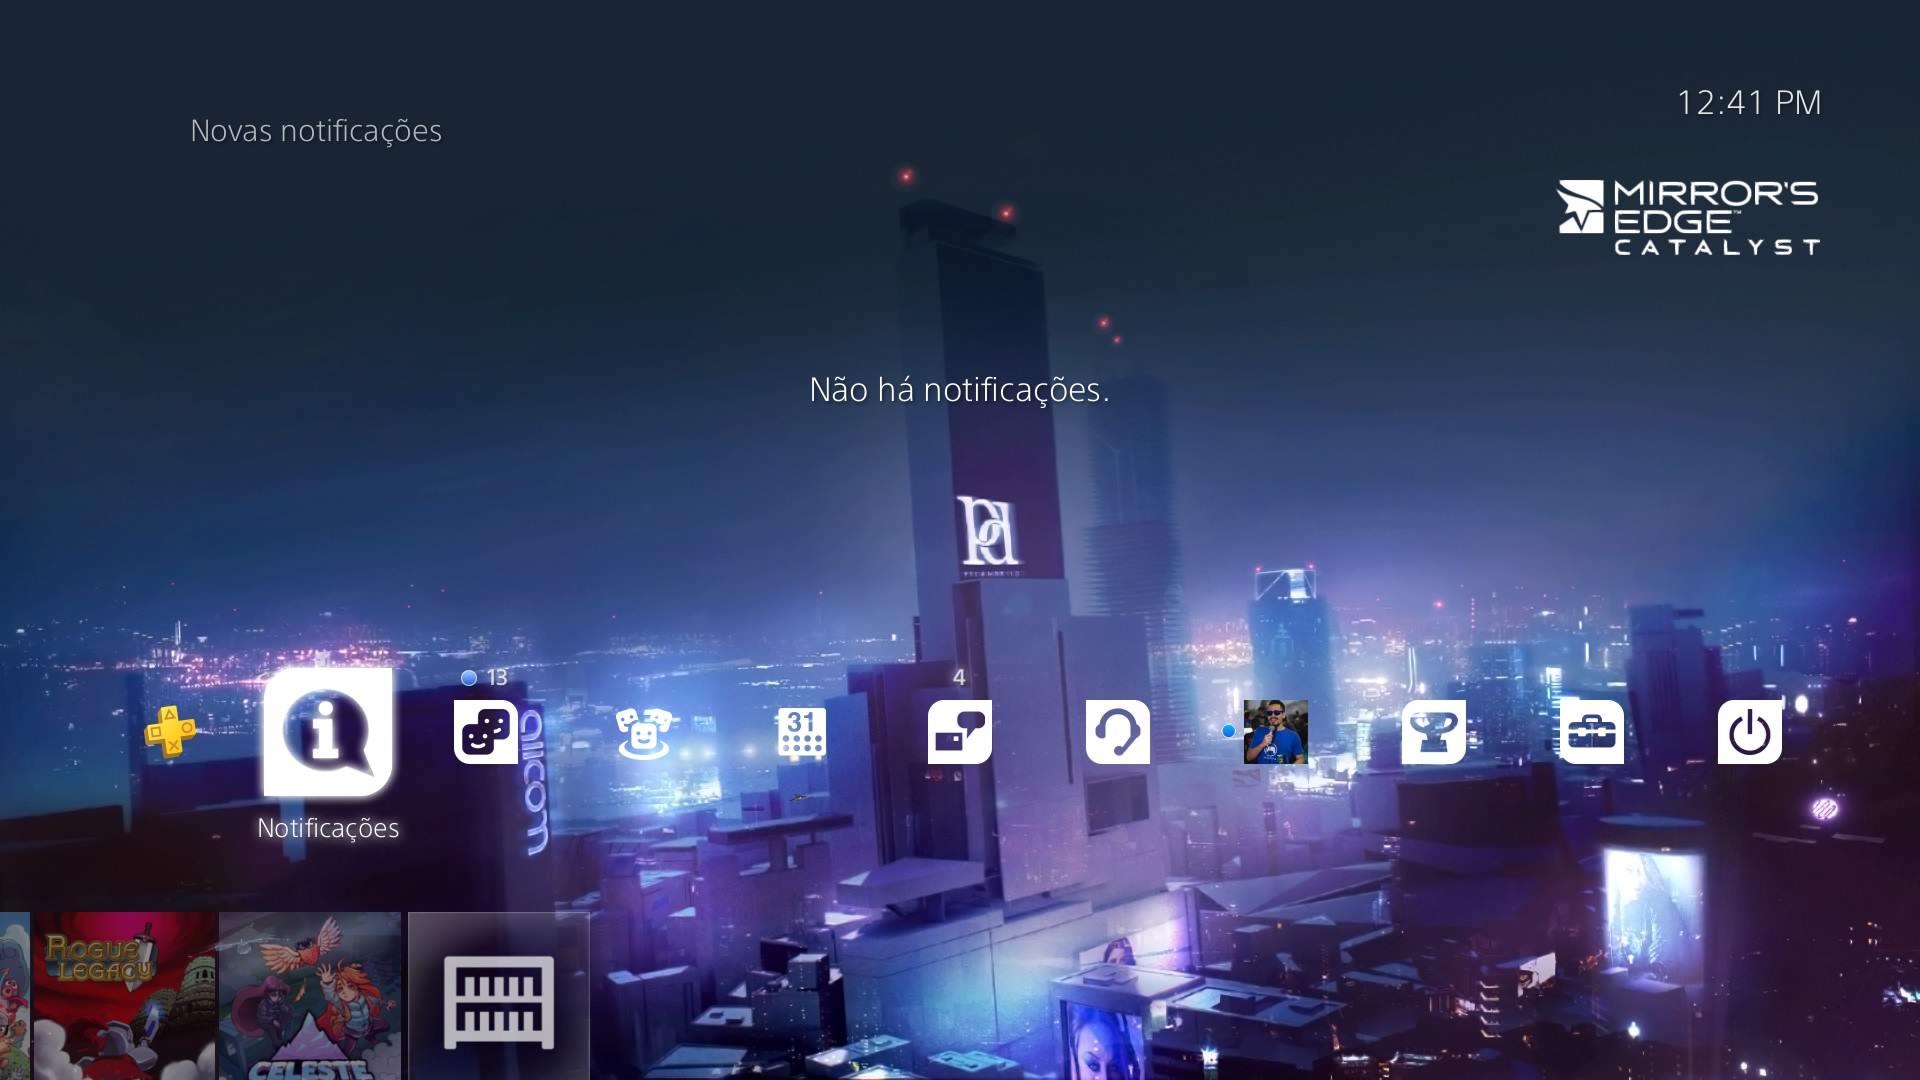 Tema gratuito de Mirror's Edge Catalyst está disponível na PS Store 2